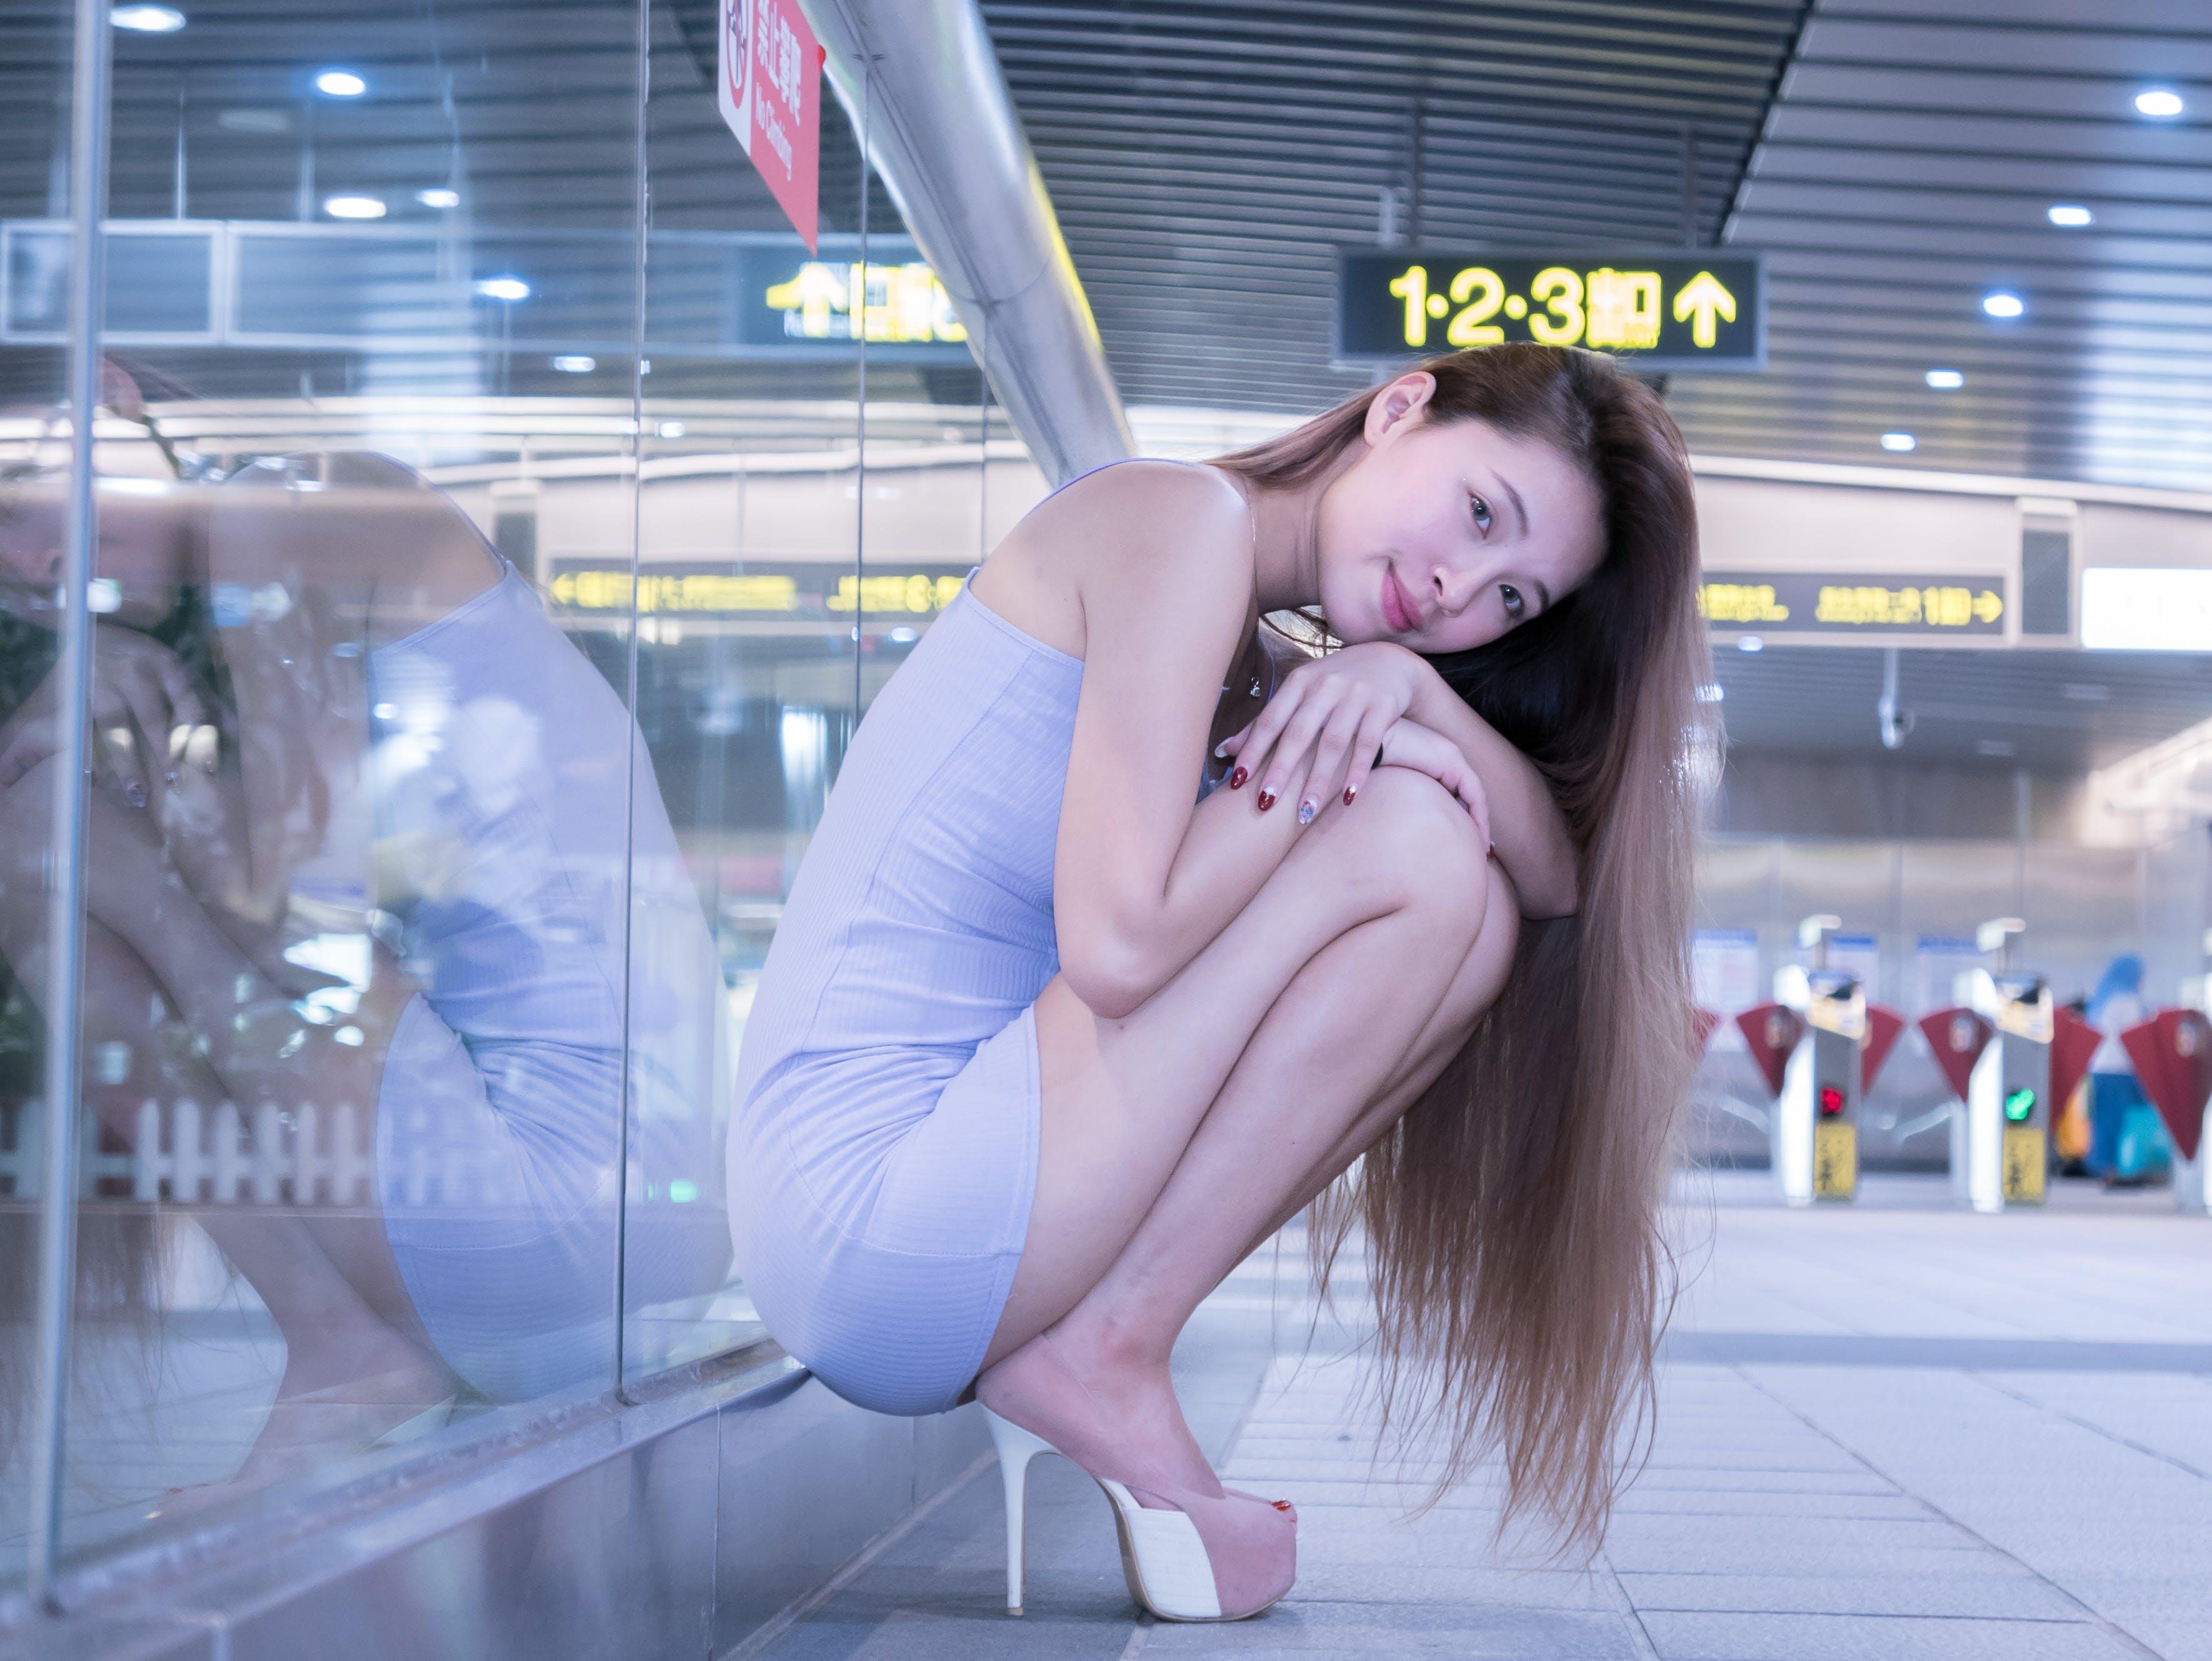 Woman Wearing Mini Dress Sitting Near Glass Wall